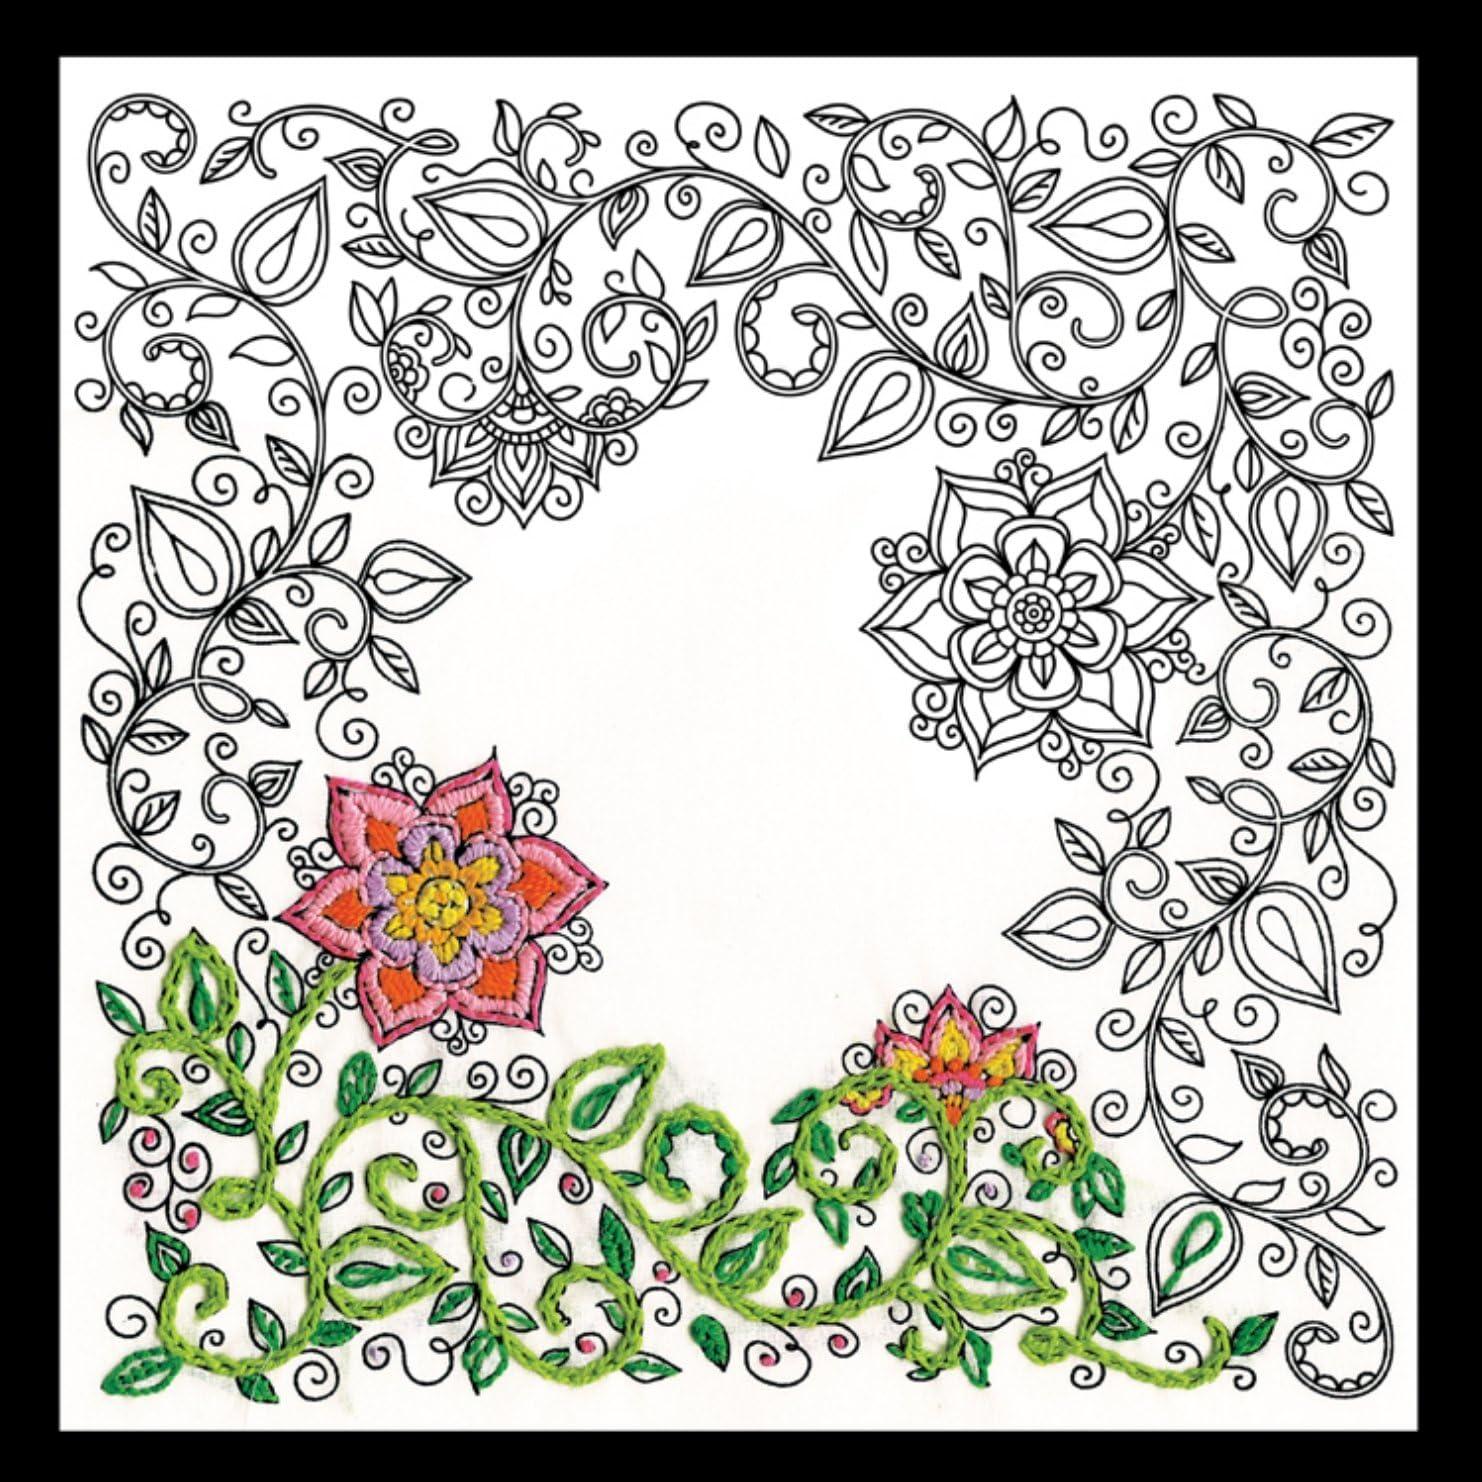 de algodón color blanco. Zenbroidery Kit de 36madejas bordado